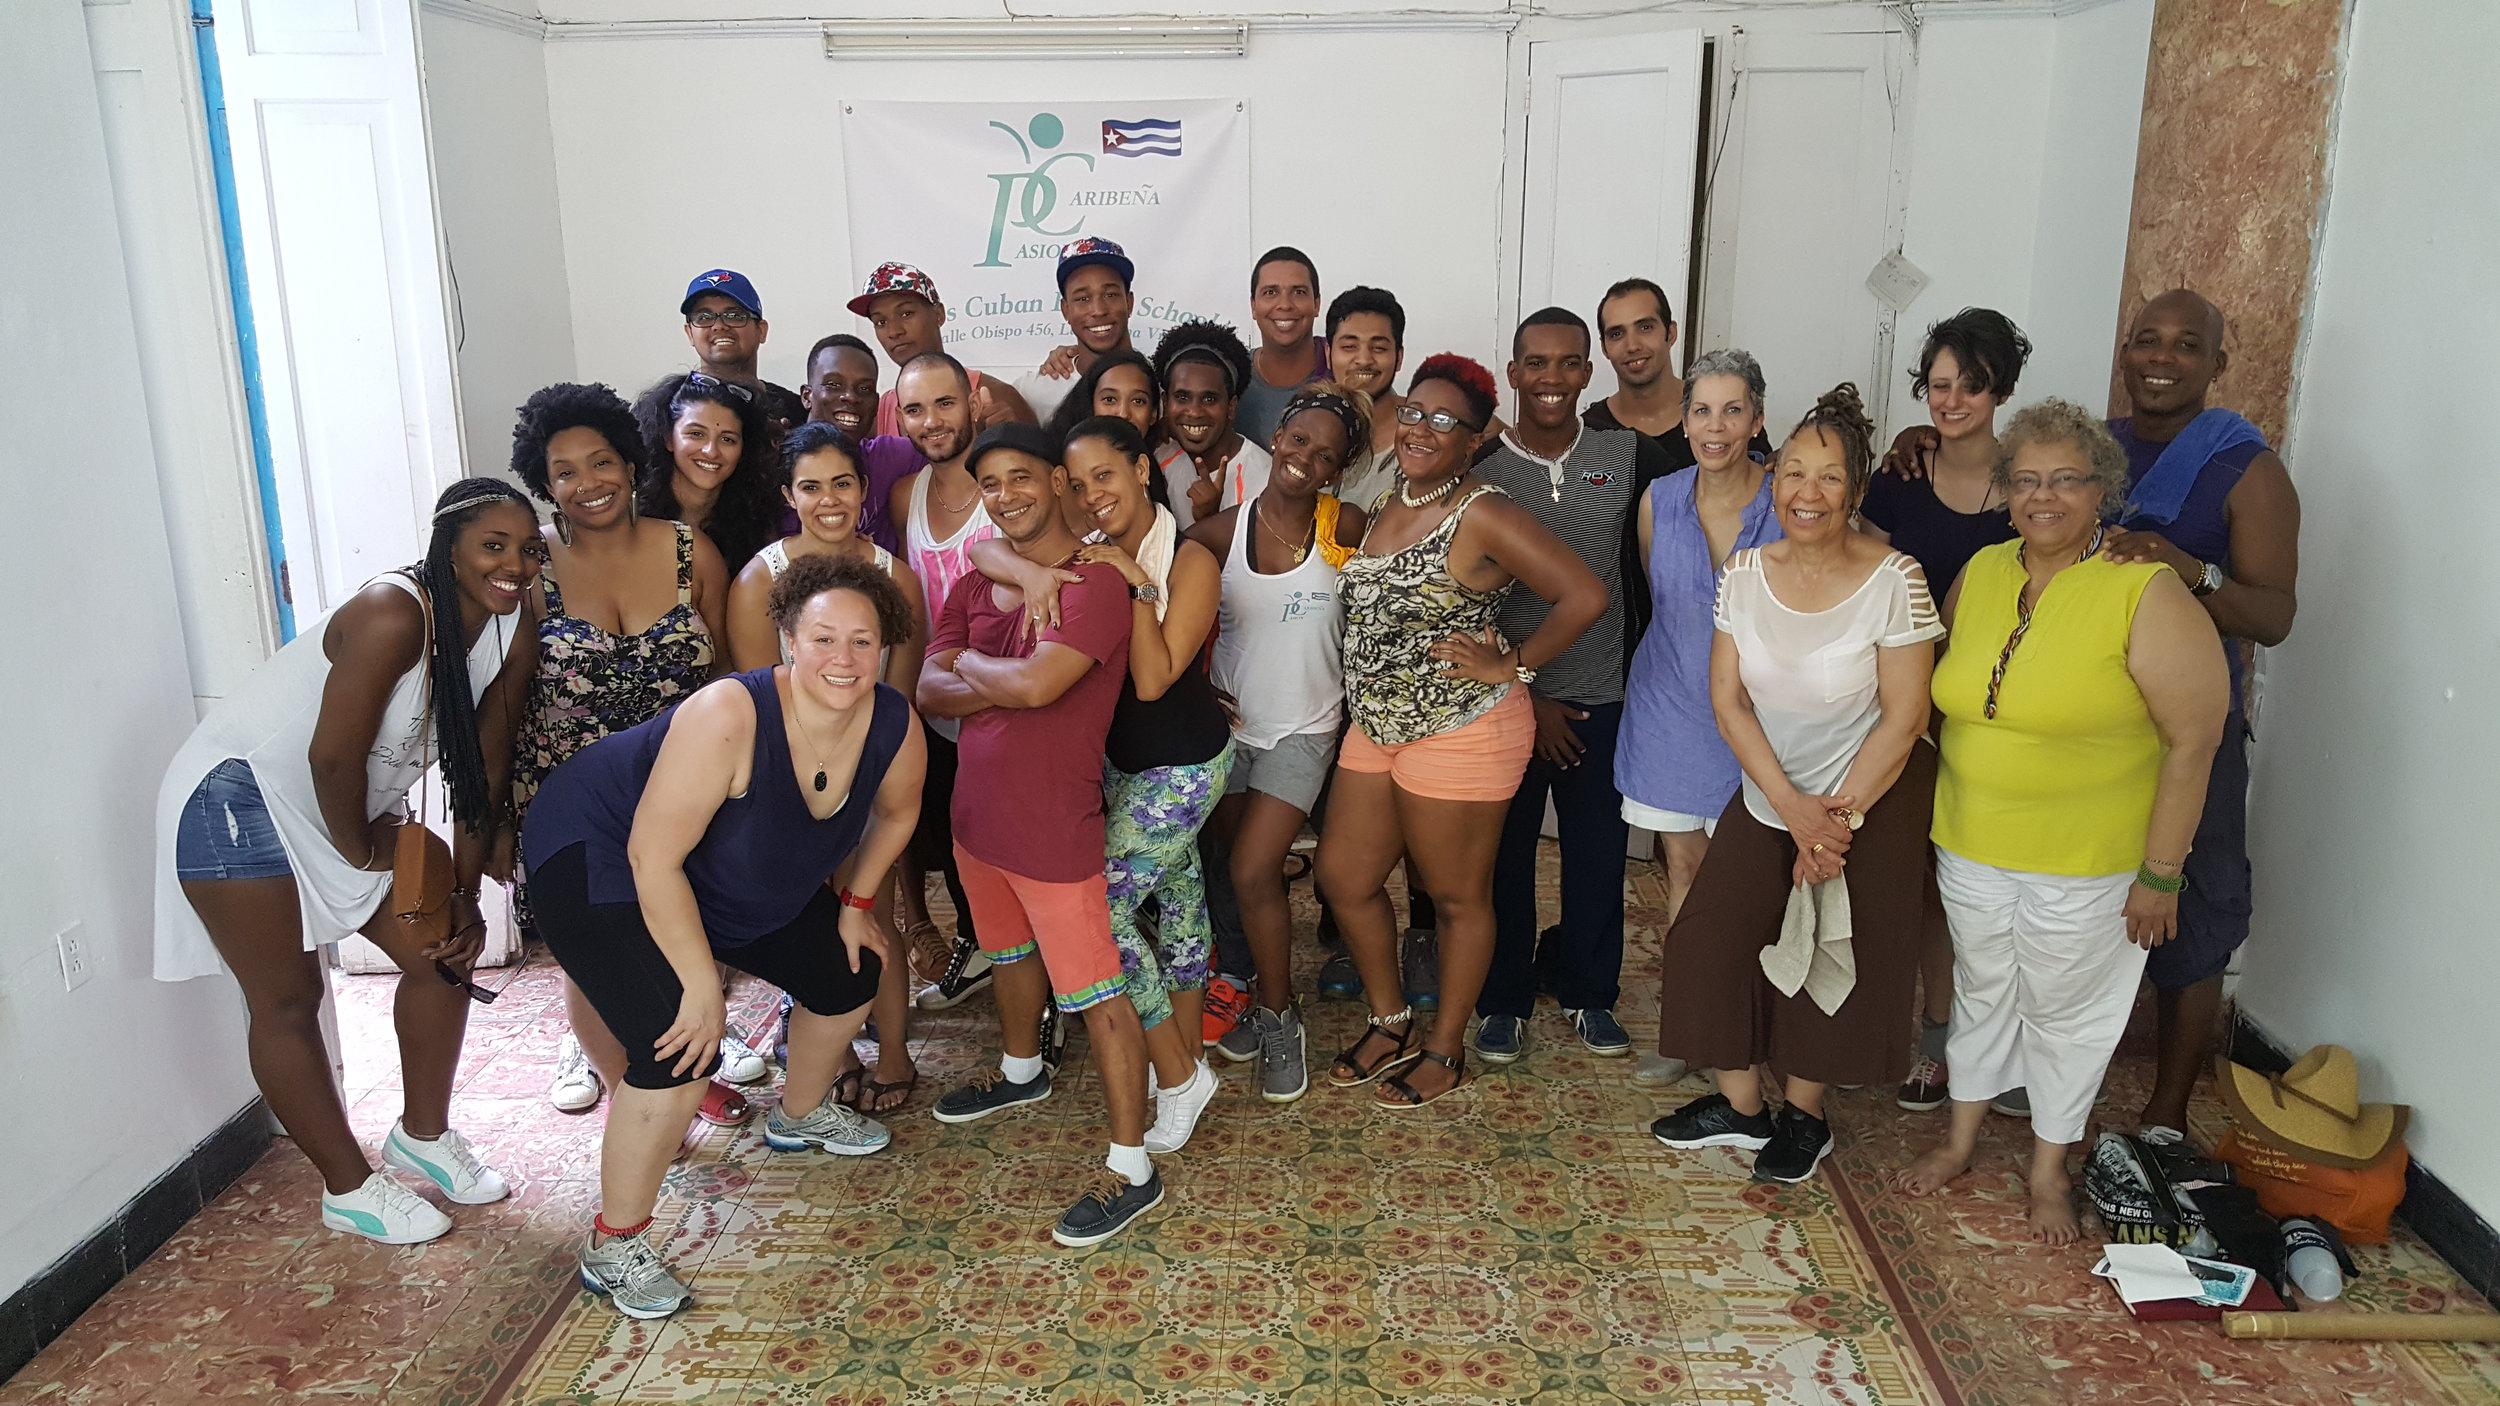 """'Step-by-Step': Cuban Dance Company Develops International Following"" - Diaspora Notable Mention - By Melissa Noel and Mikhael SimmondsArticleNBC NewsDecember 30, 2016"